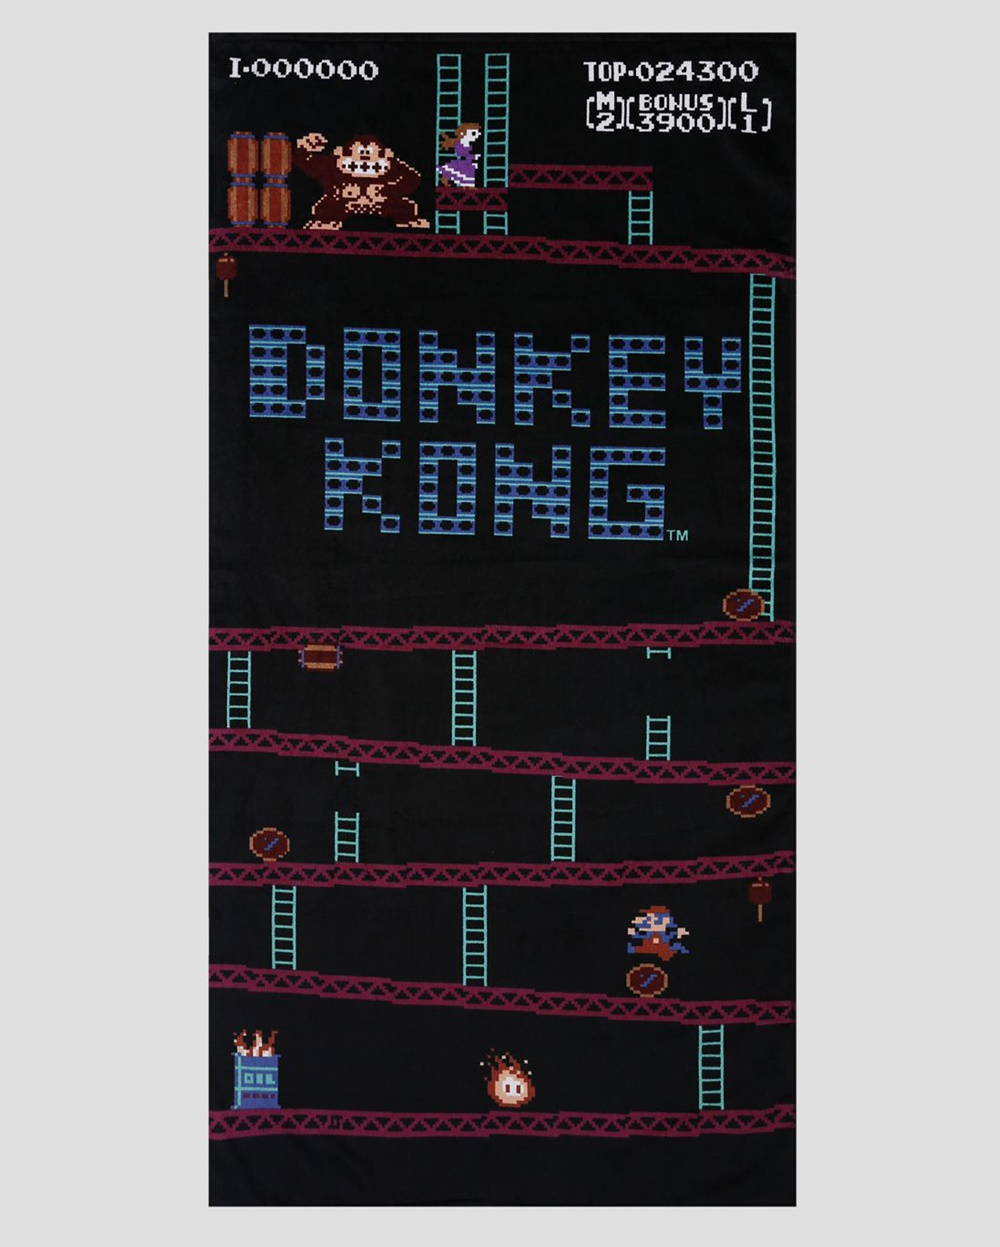 Toalha de Praia Donkey Kong R$ 49,90